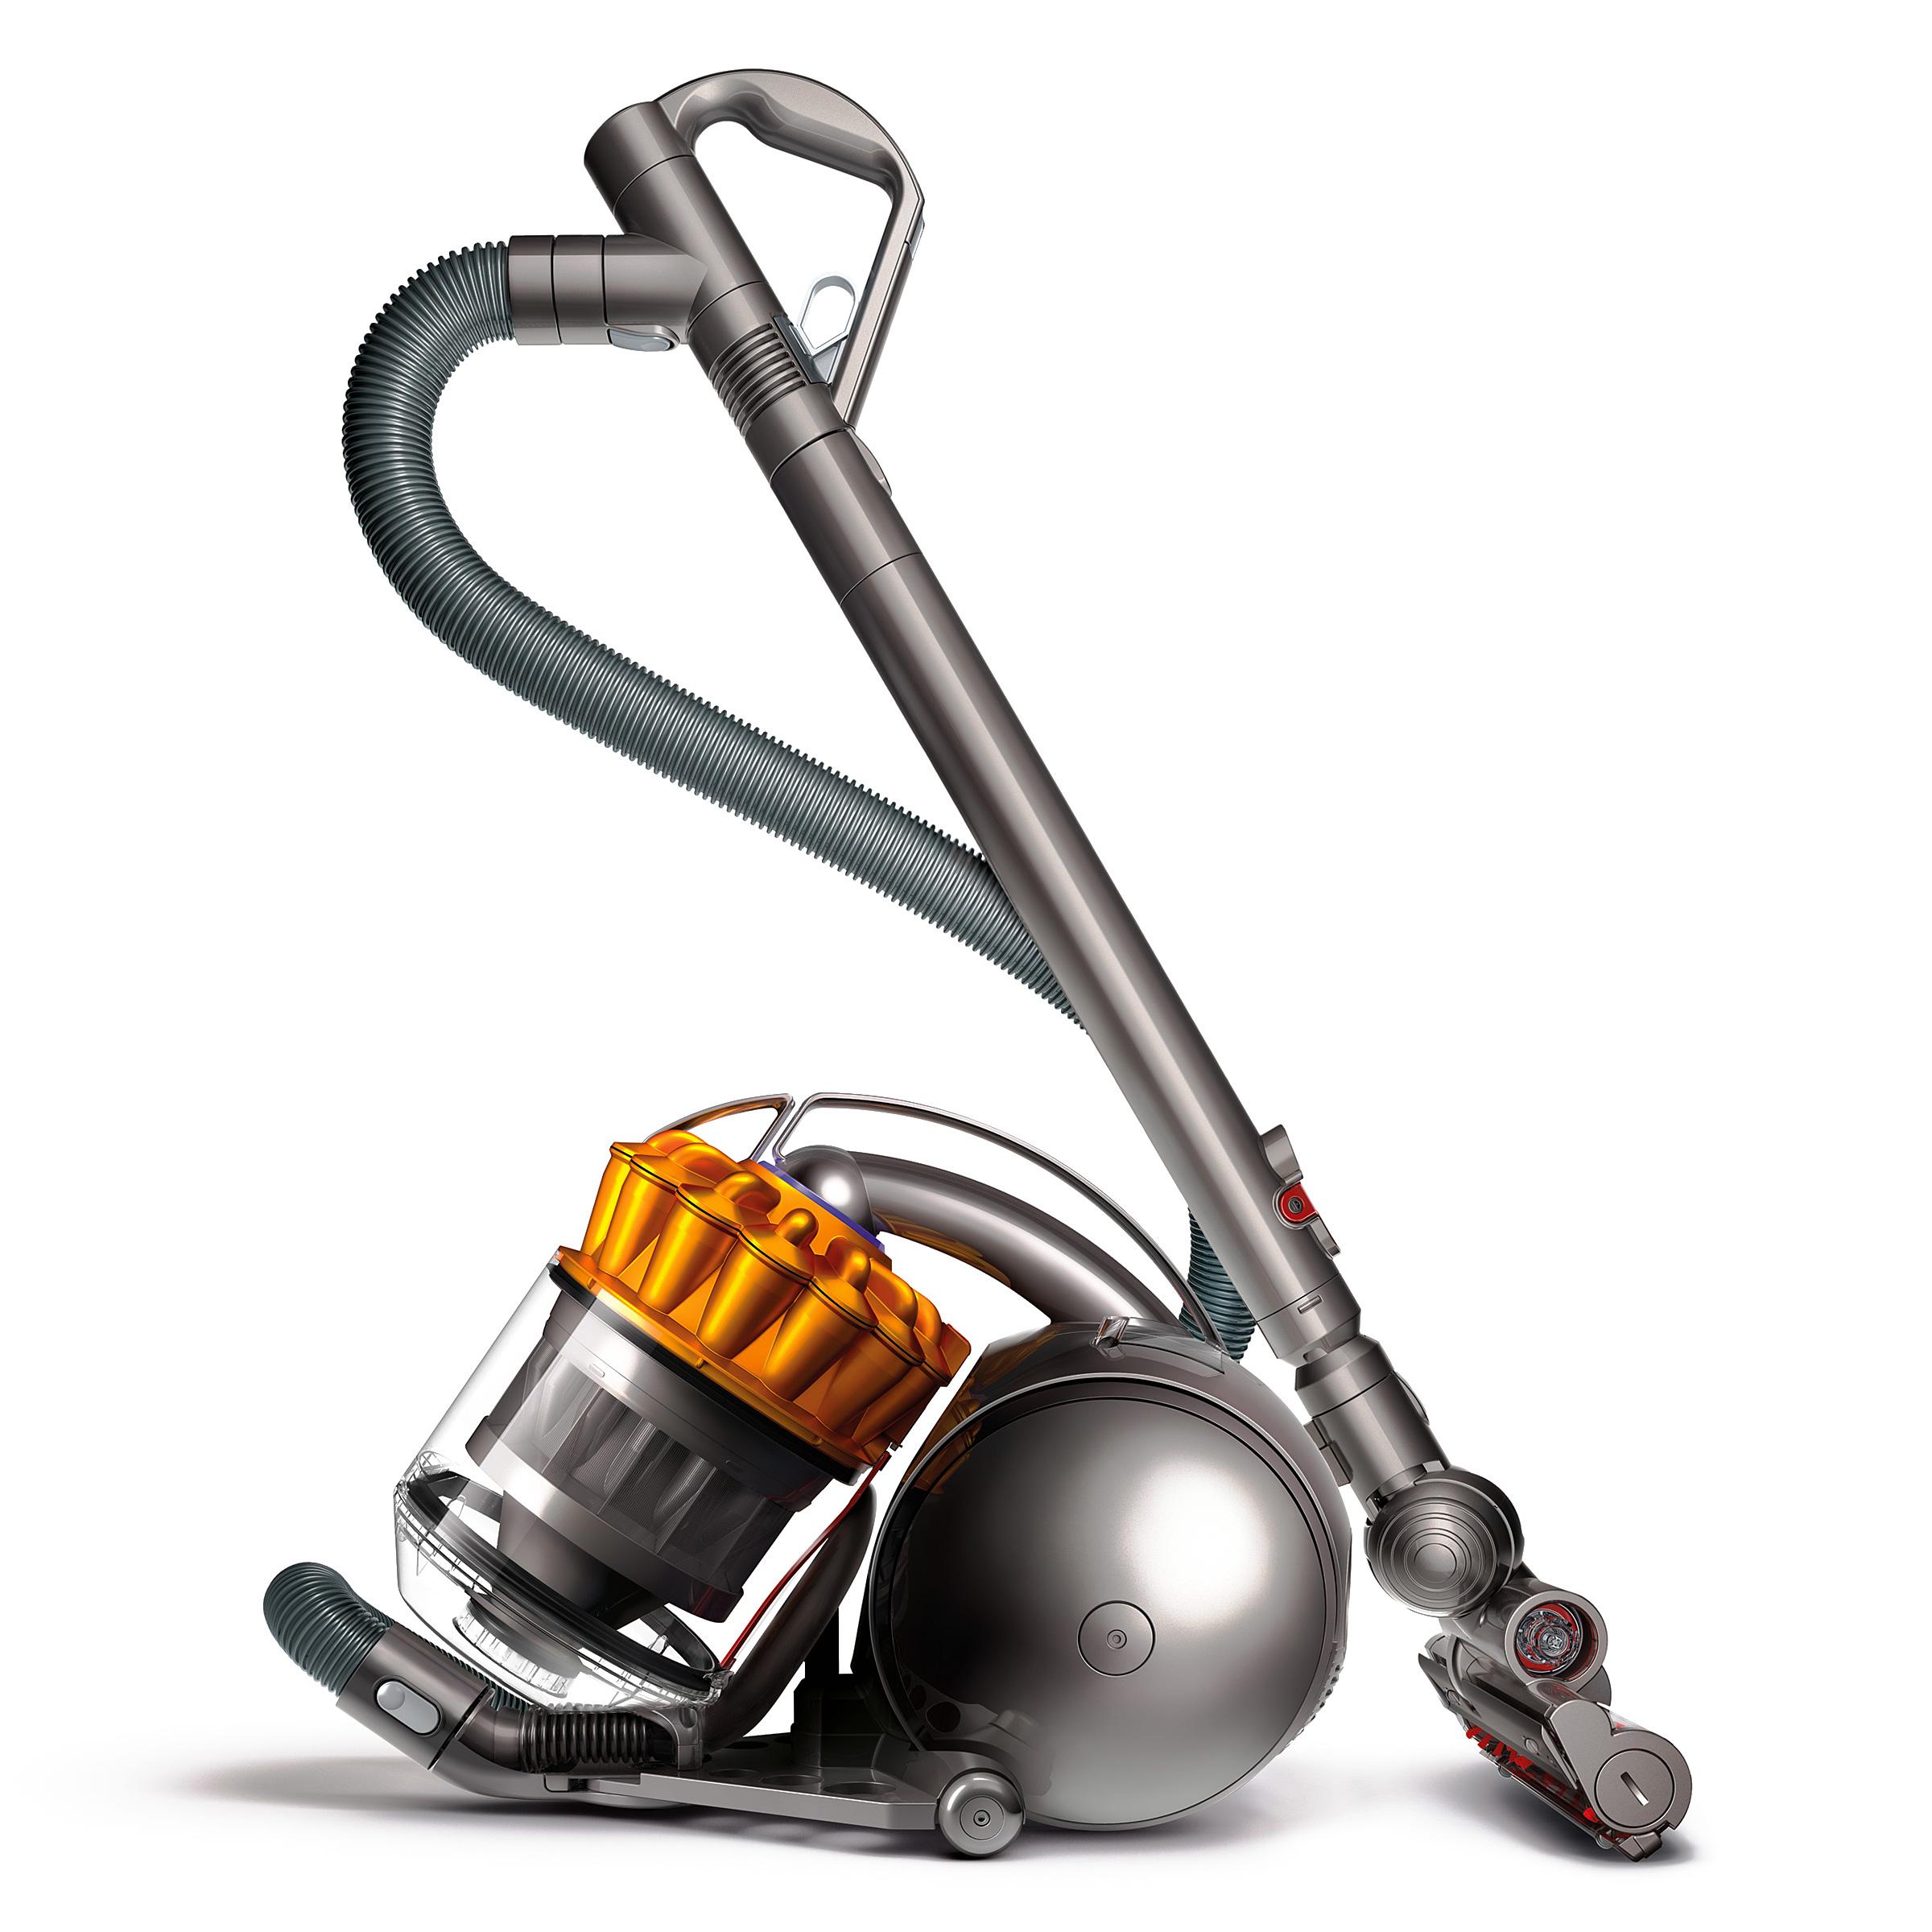 Dyson Ball Multi Floor Canister Vacuum (DC39)